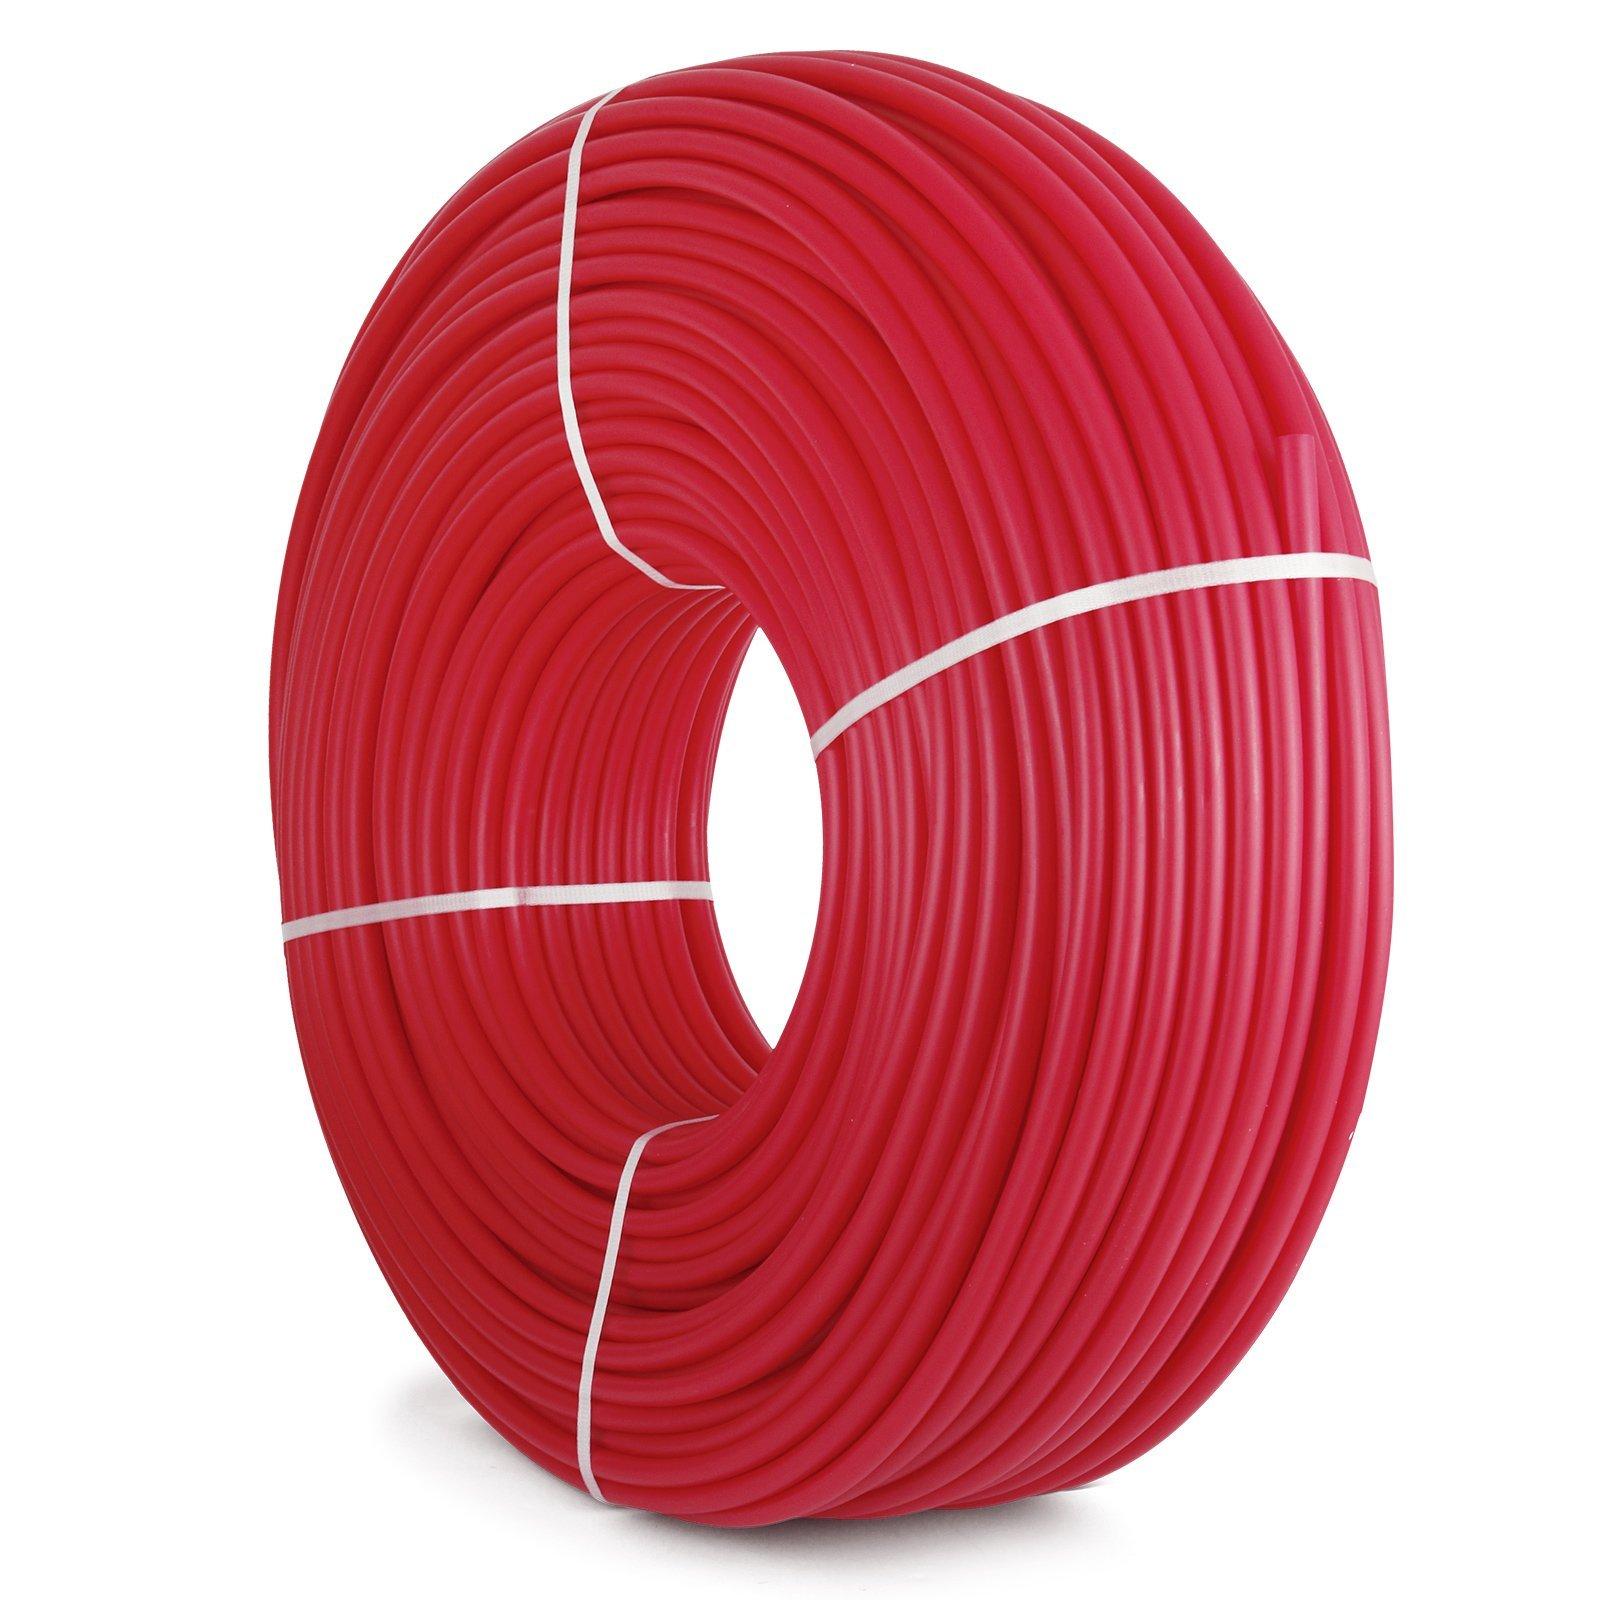 VEVOR 1/2'' x 900ft PEX Tubing Oxygen Barrier O2 EVOH Pex-B Red Hydronic Radiant Floor Heat Heating System Pex Pipe Pex Tube (1/2'' 900ft, Red, Oxygen Barrier)